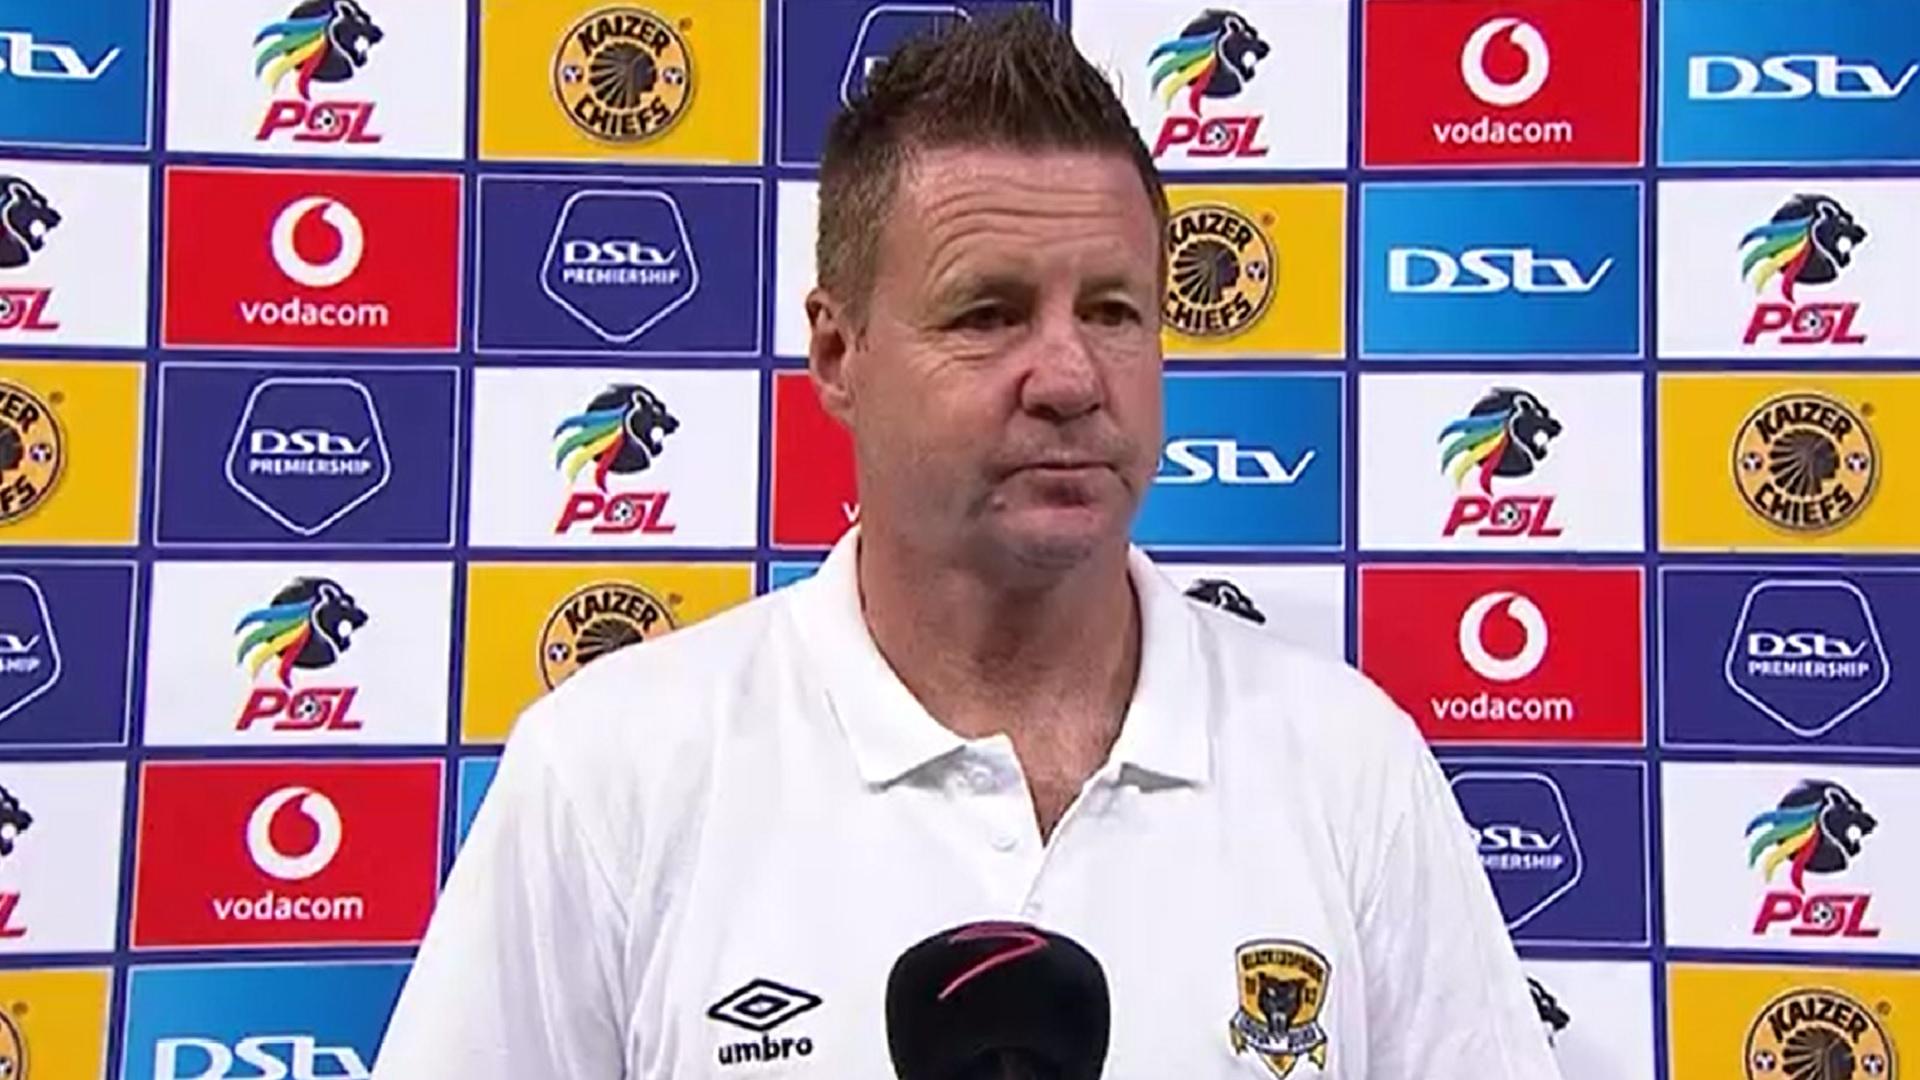 DStv Premiership | Kaizer Chiefs v Black Leopards | Post-match interview with Dylan Kerr